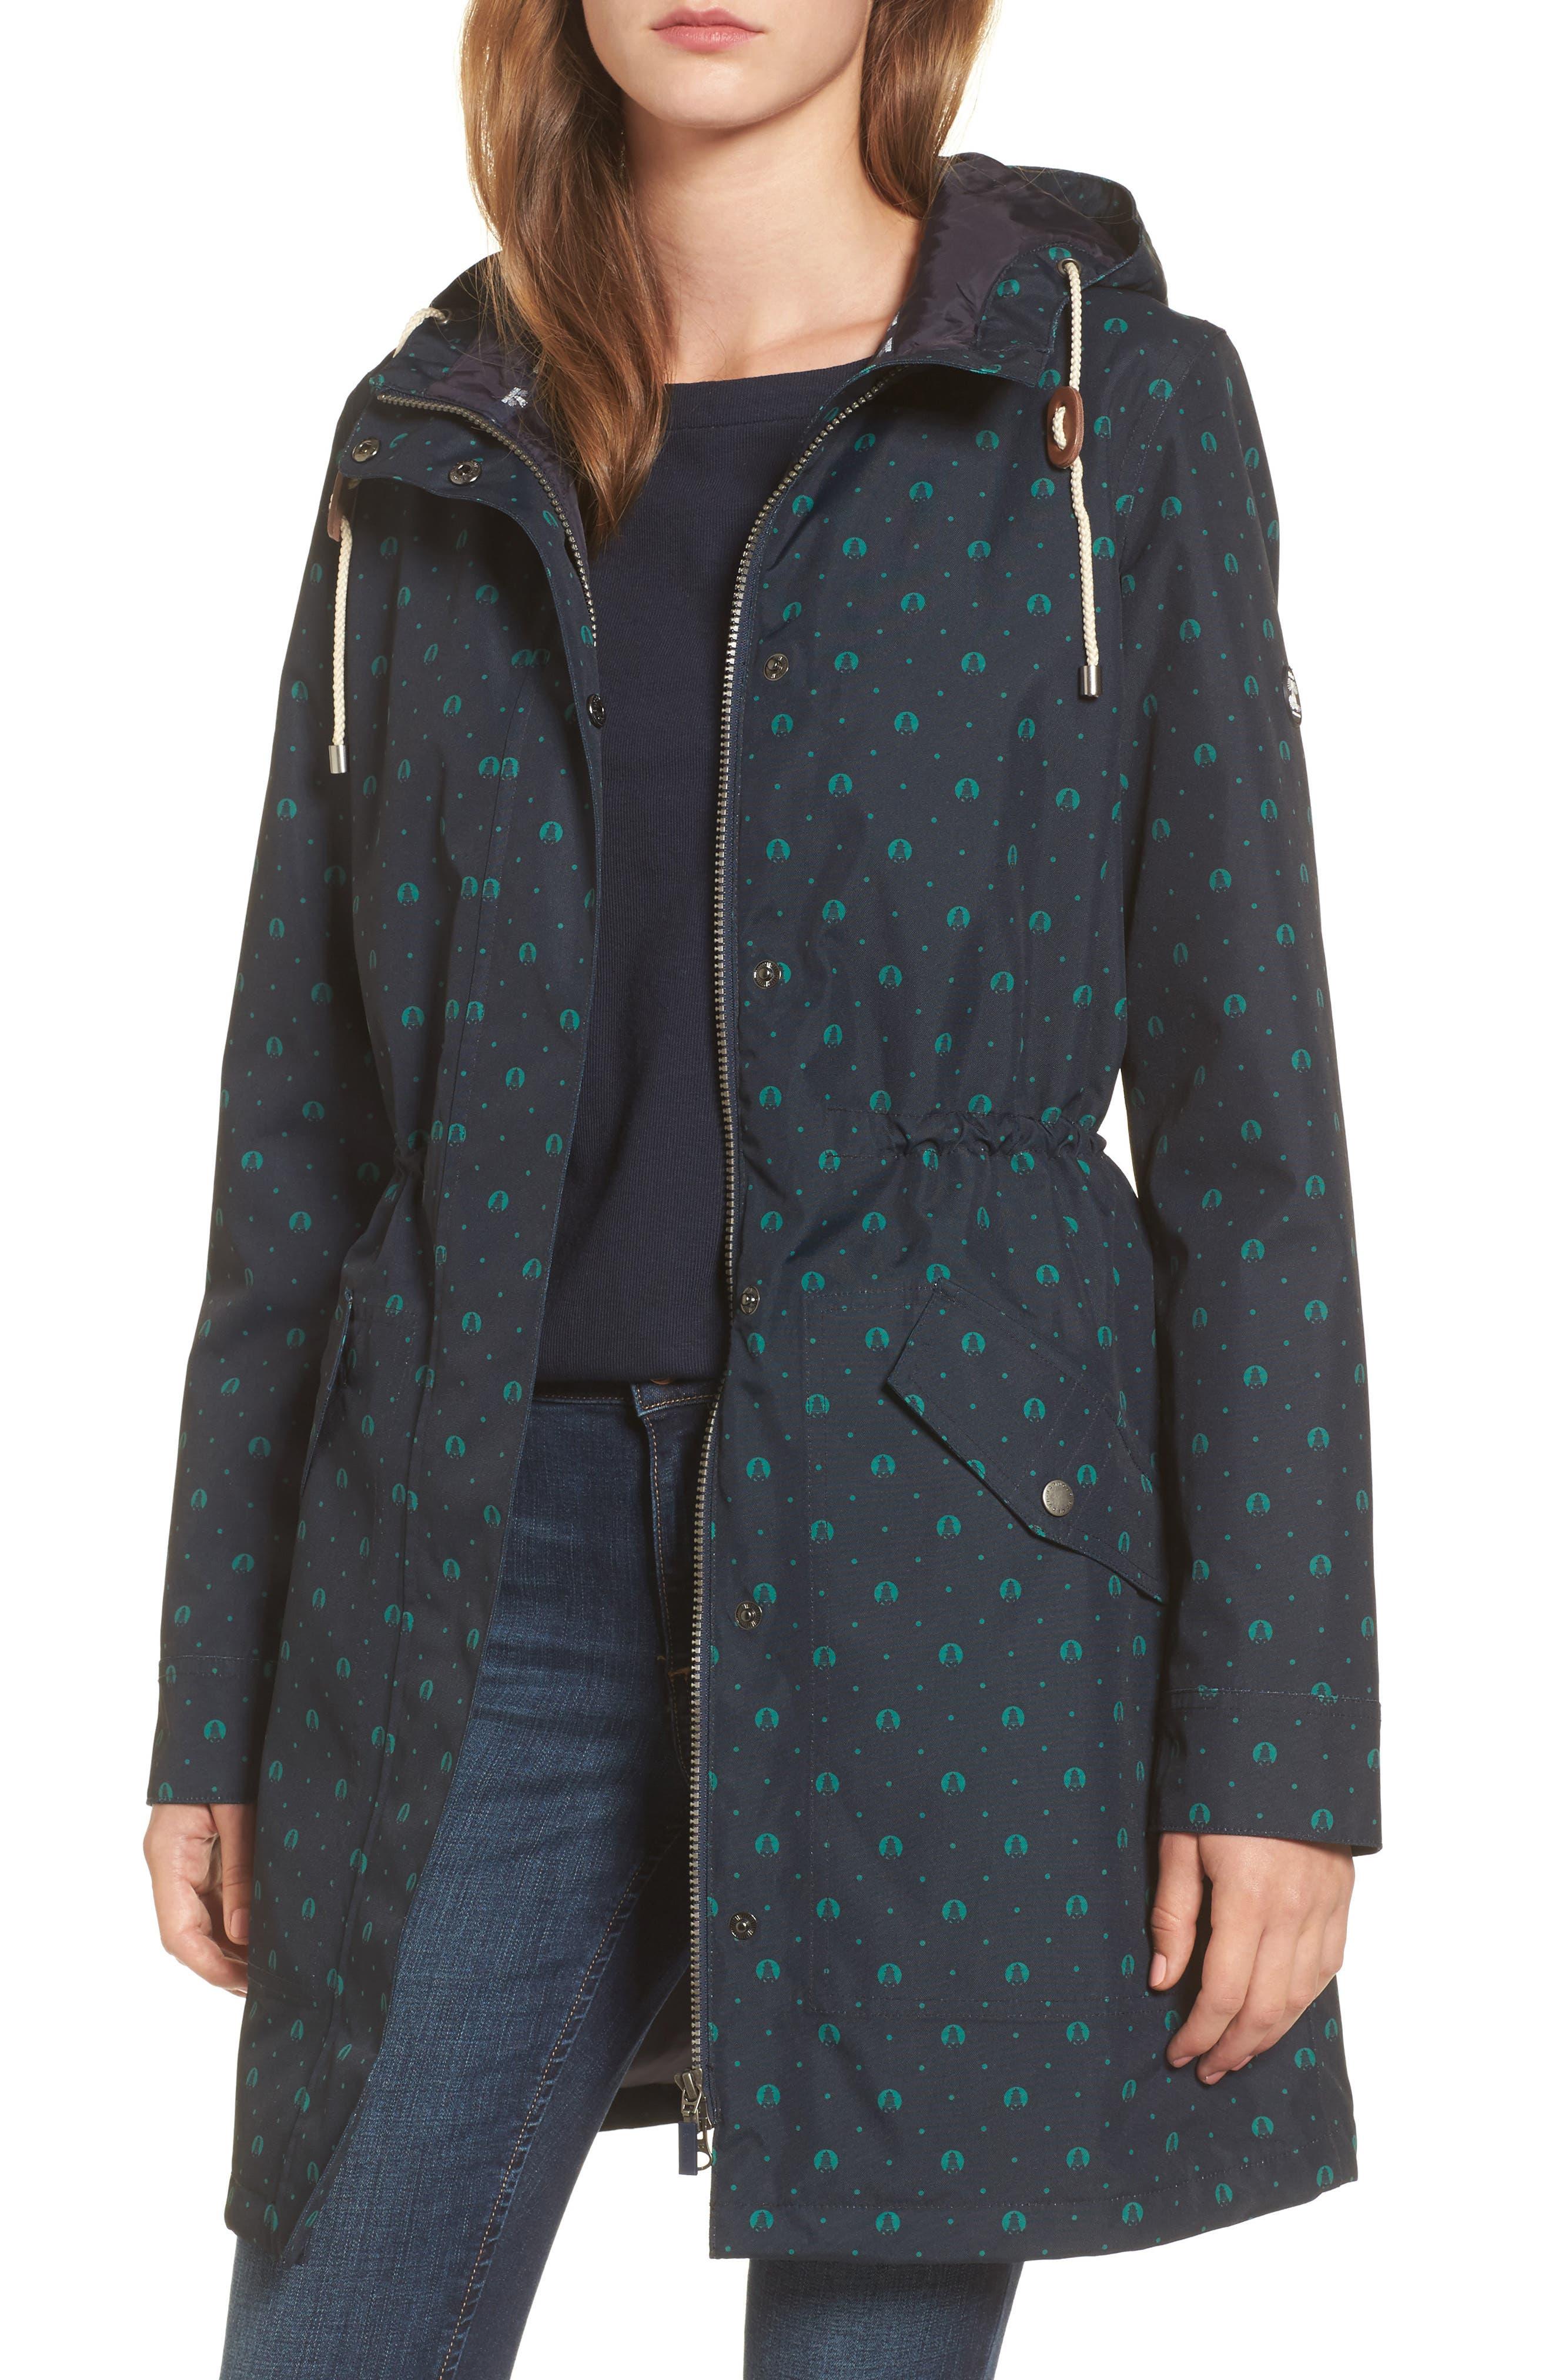 Decoy Anorak Jacket,                         Main,                         color, Navy / Evergreen Beacon S